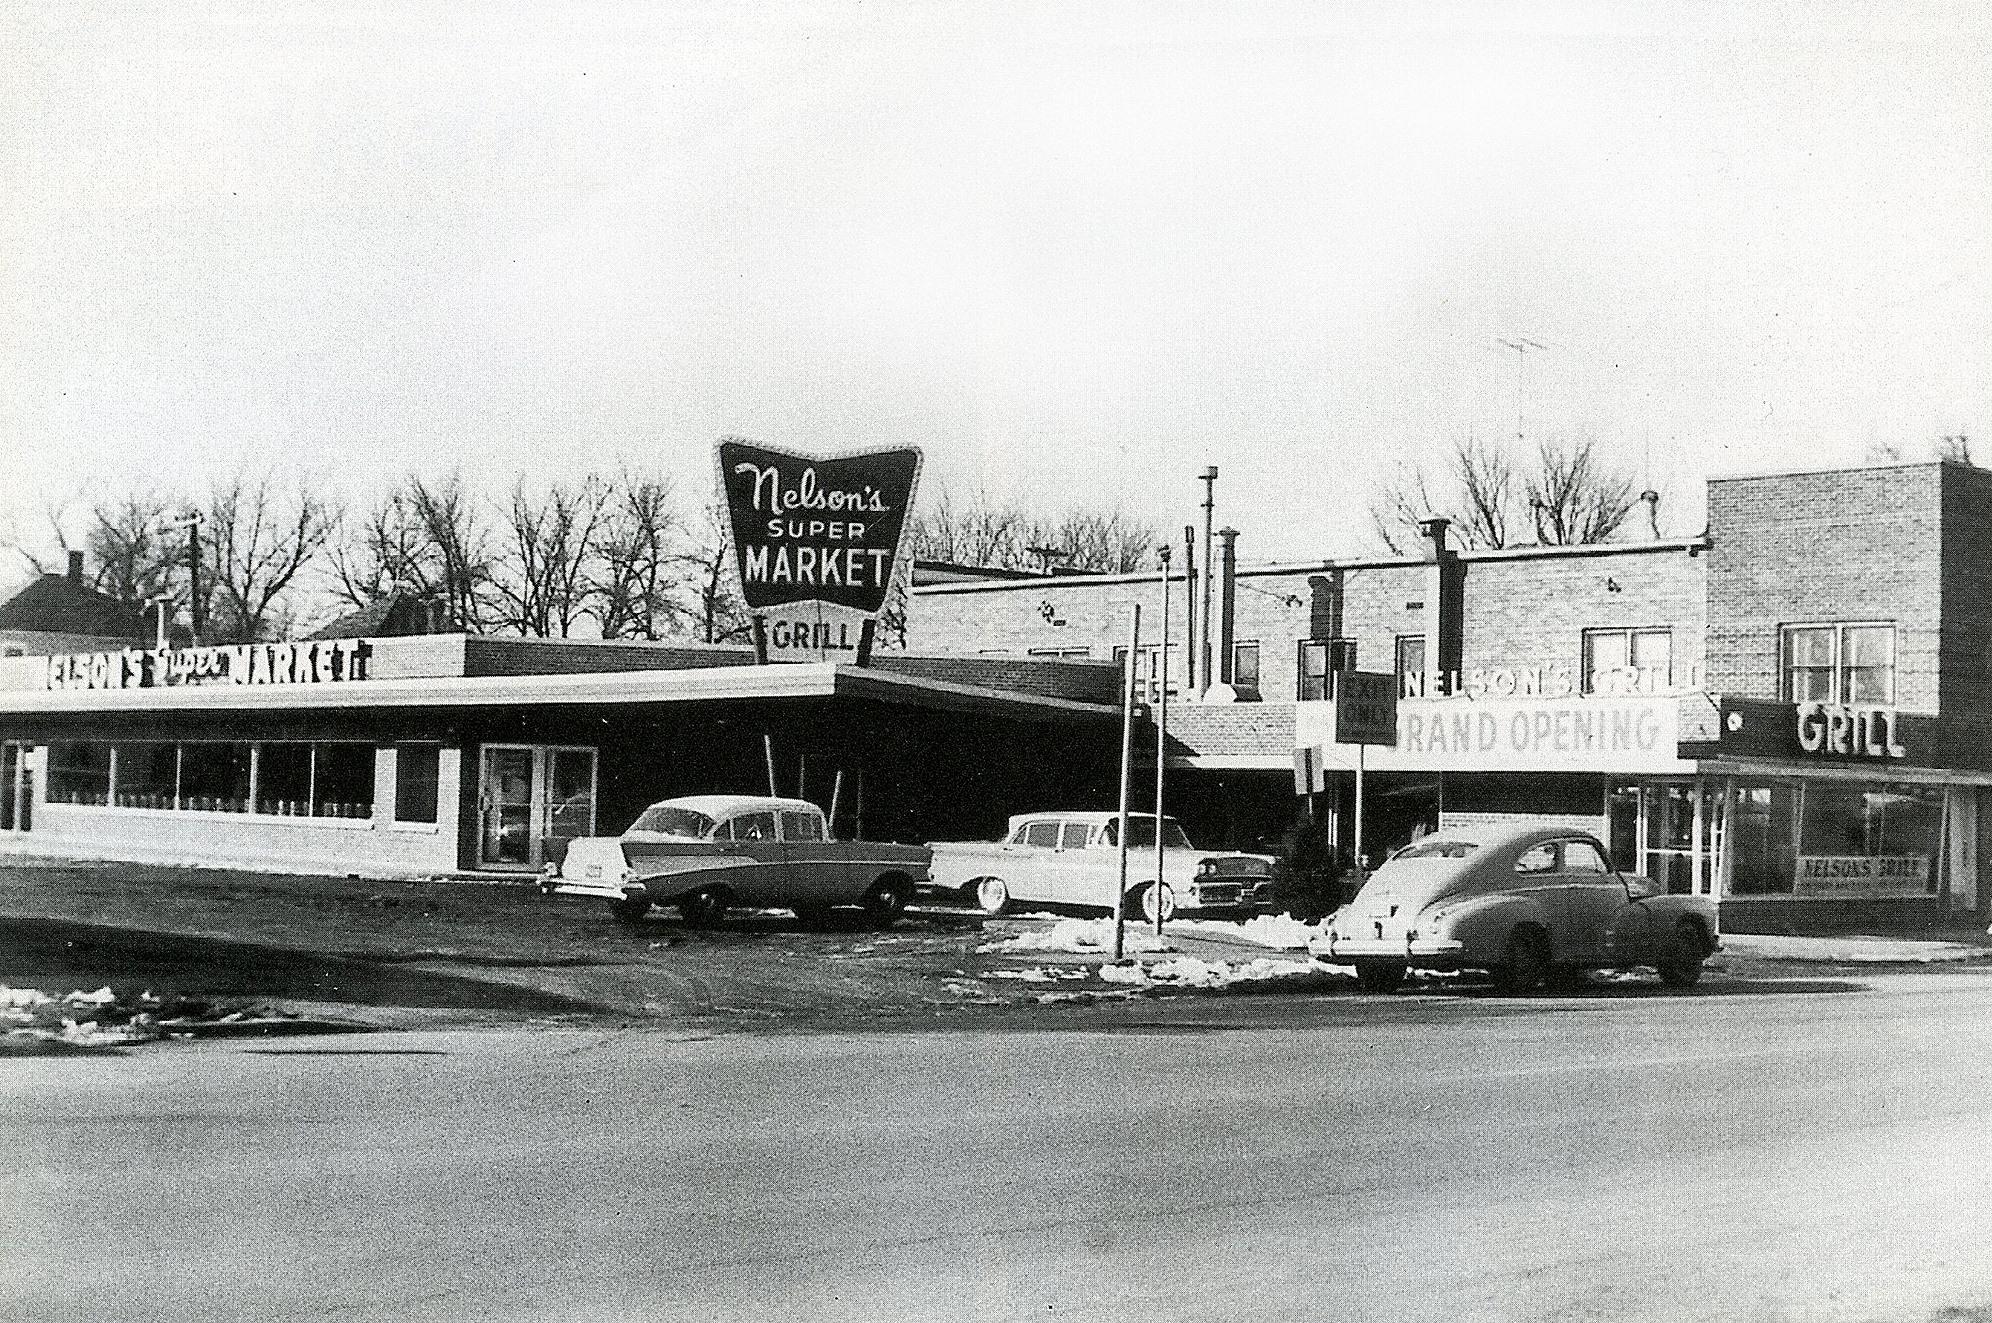 Nelson's Super Market & Grill burned on Jan. 7th 1969 Austin, Mn